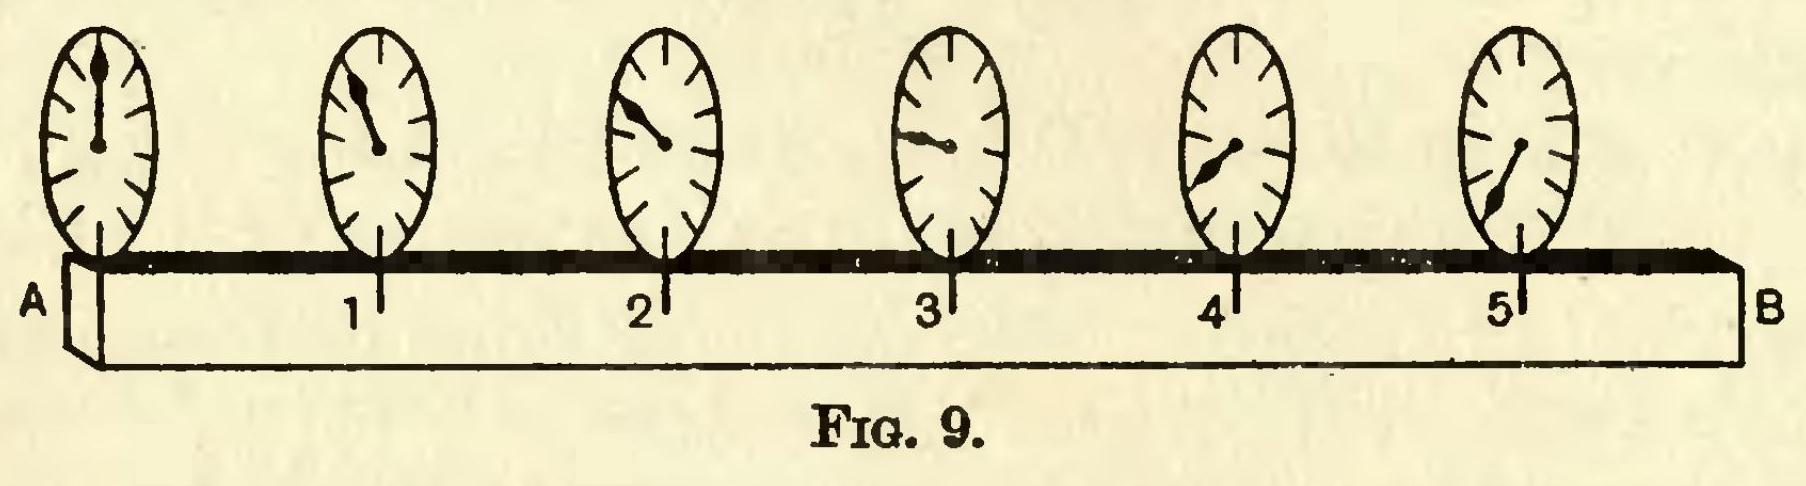 File:Eddington A. Space Time and Gravitation. Fig. 9.jpg ...